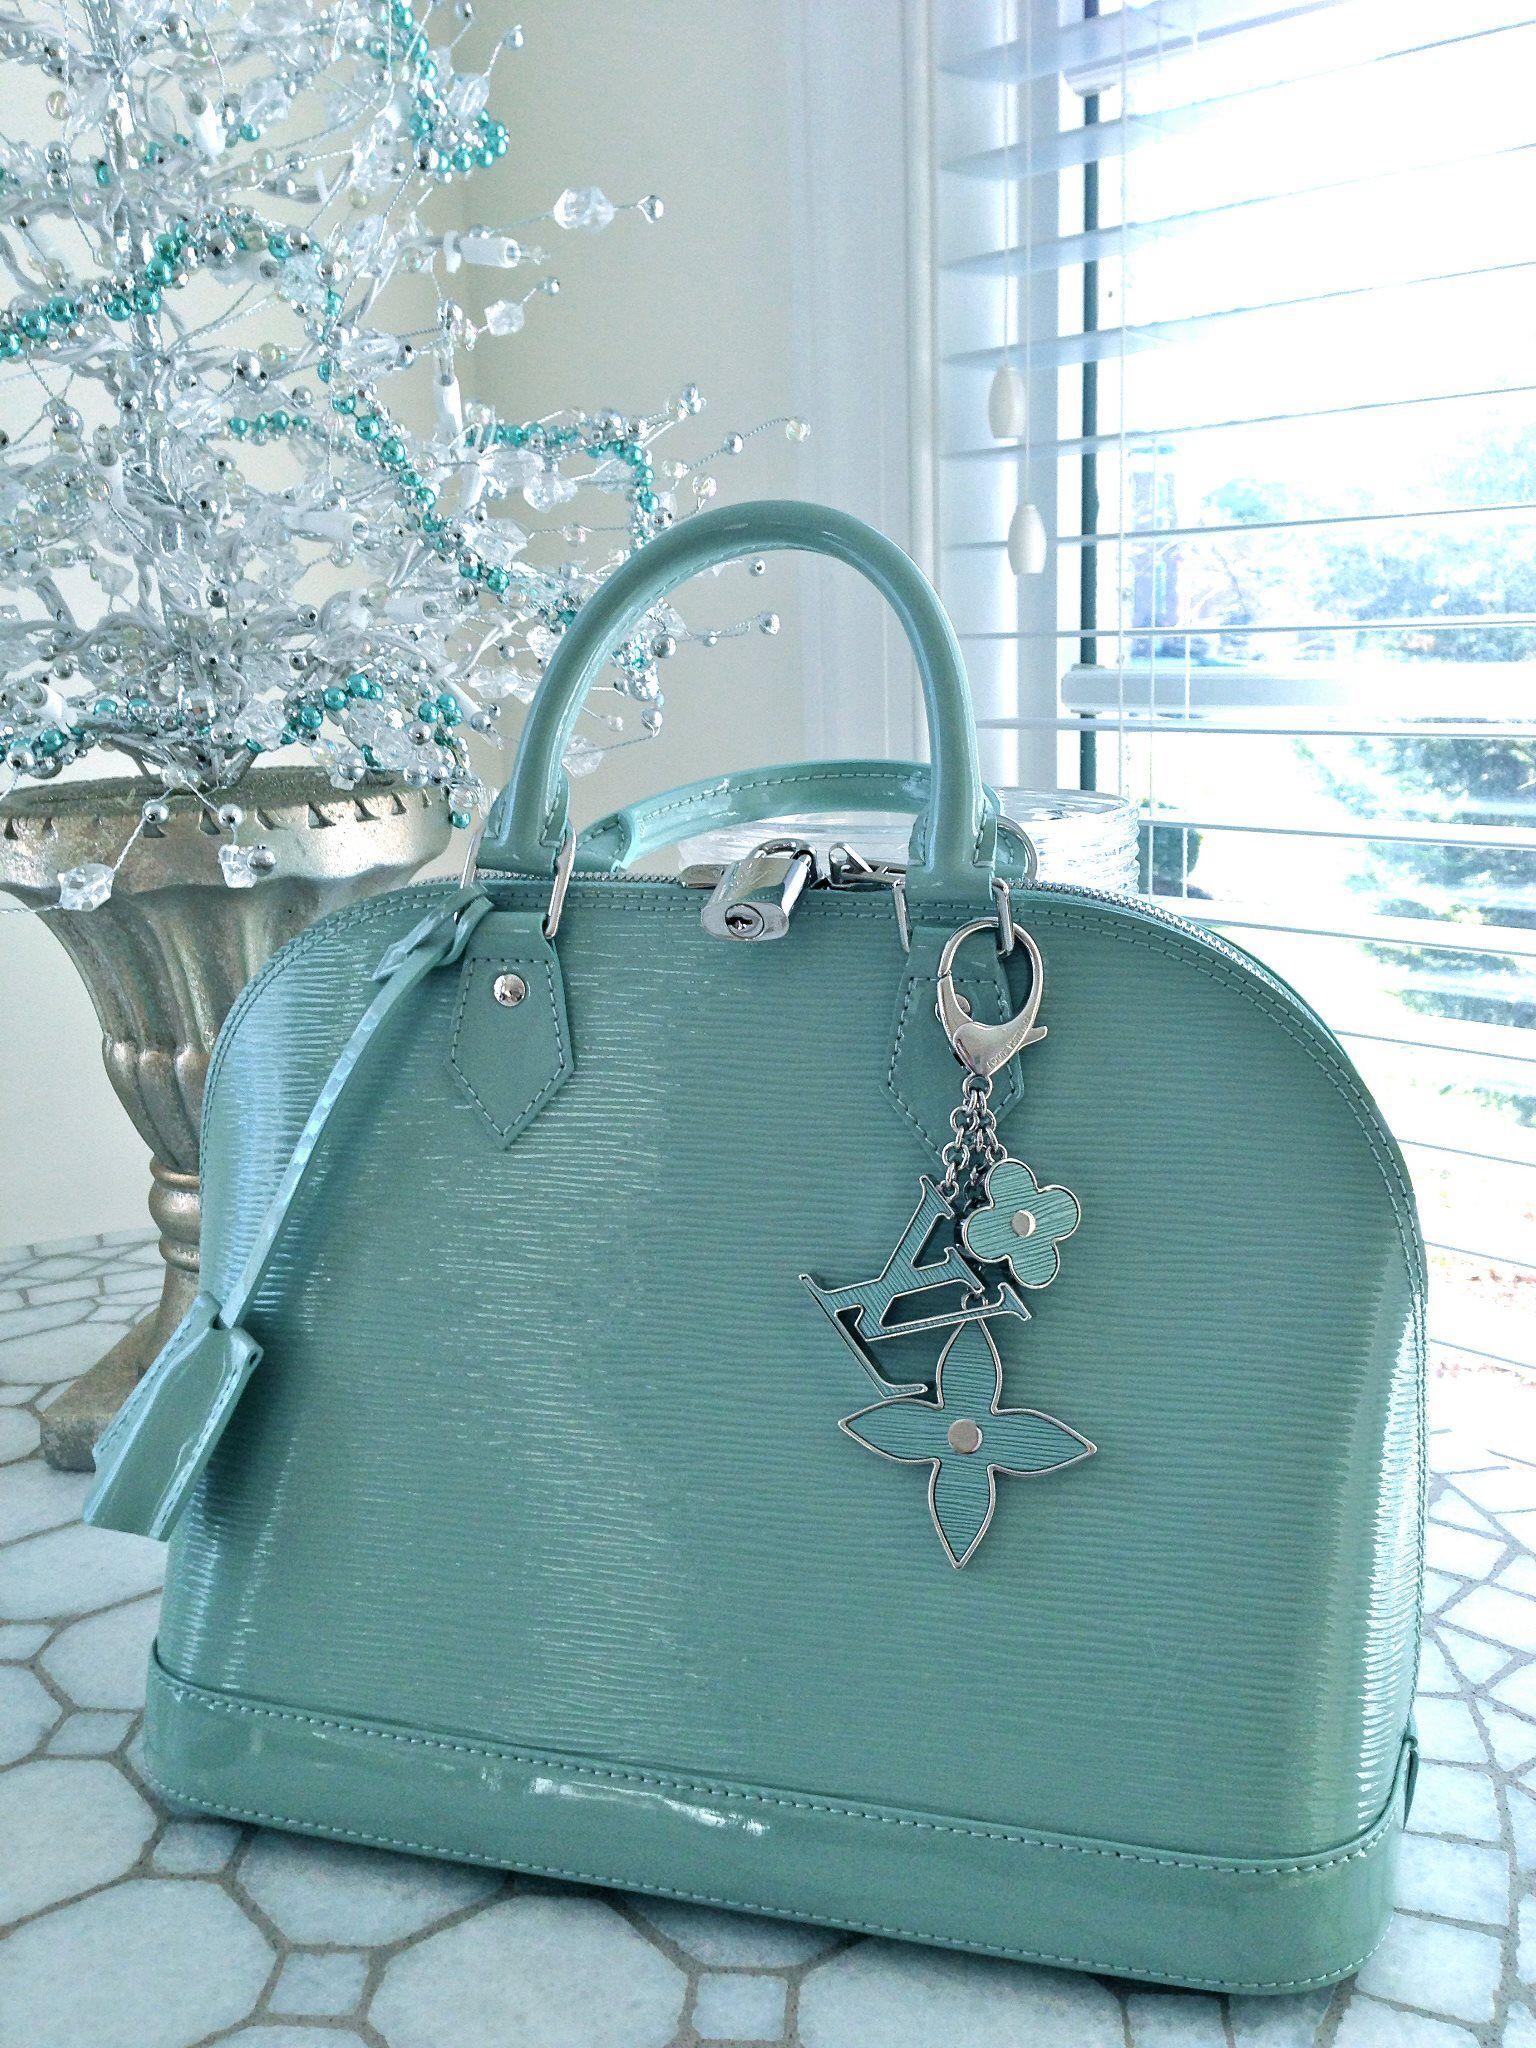 Louis Vuitton Tiffany Blue Alma Purses And Handbags Bags Designer Bags